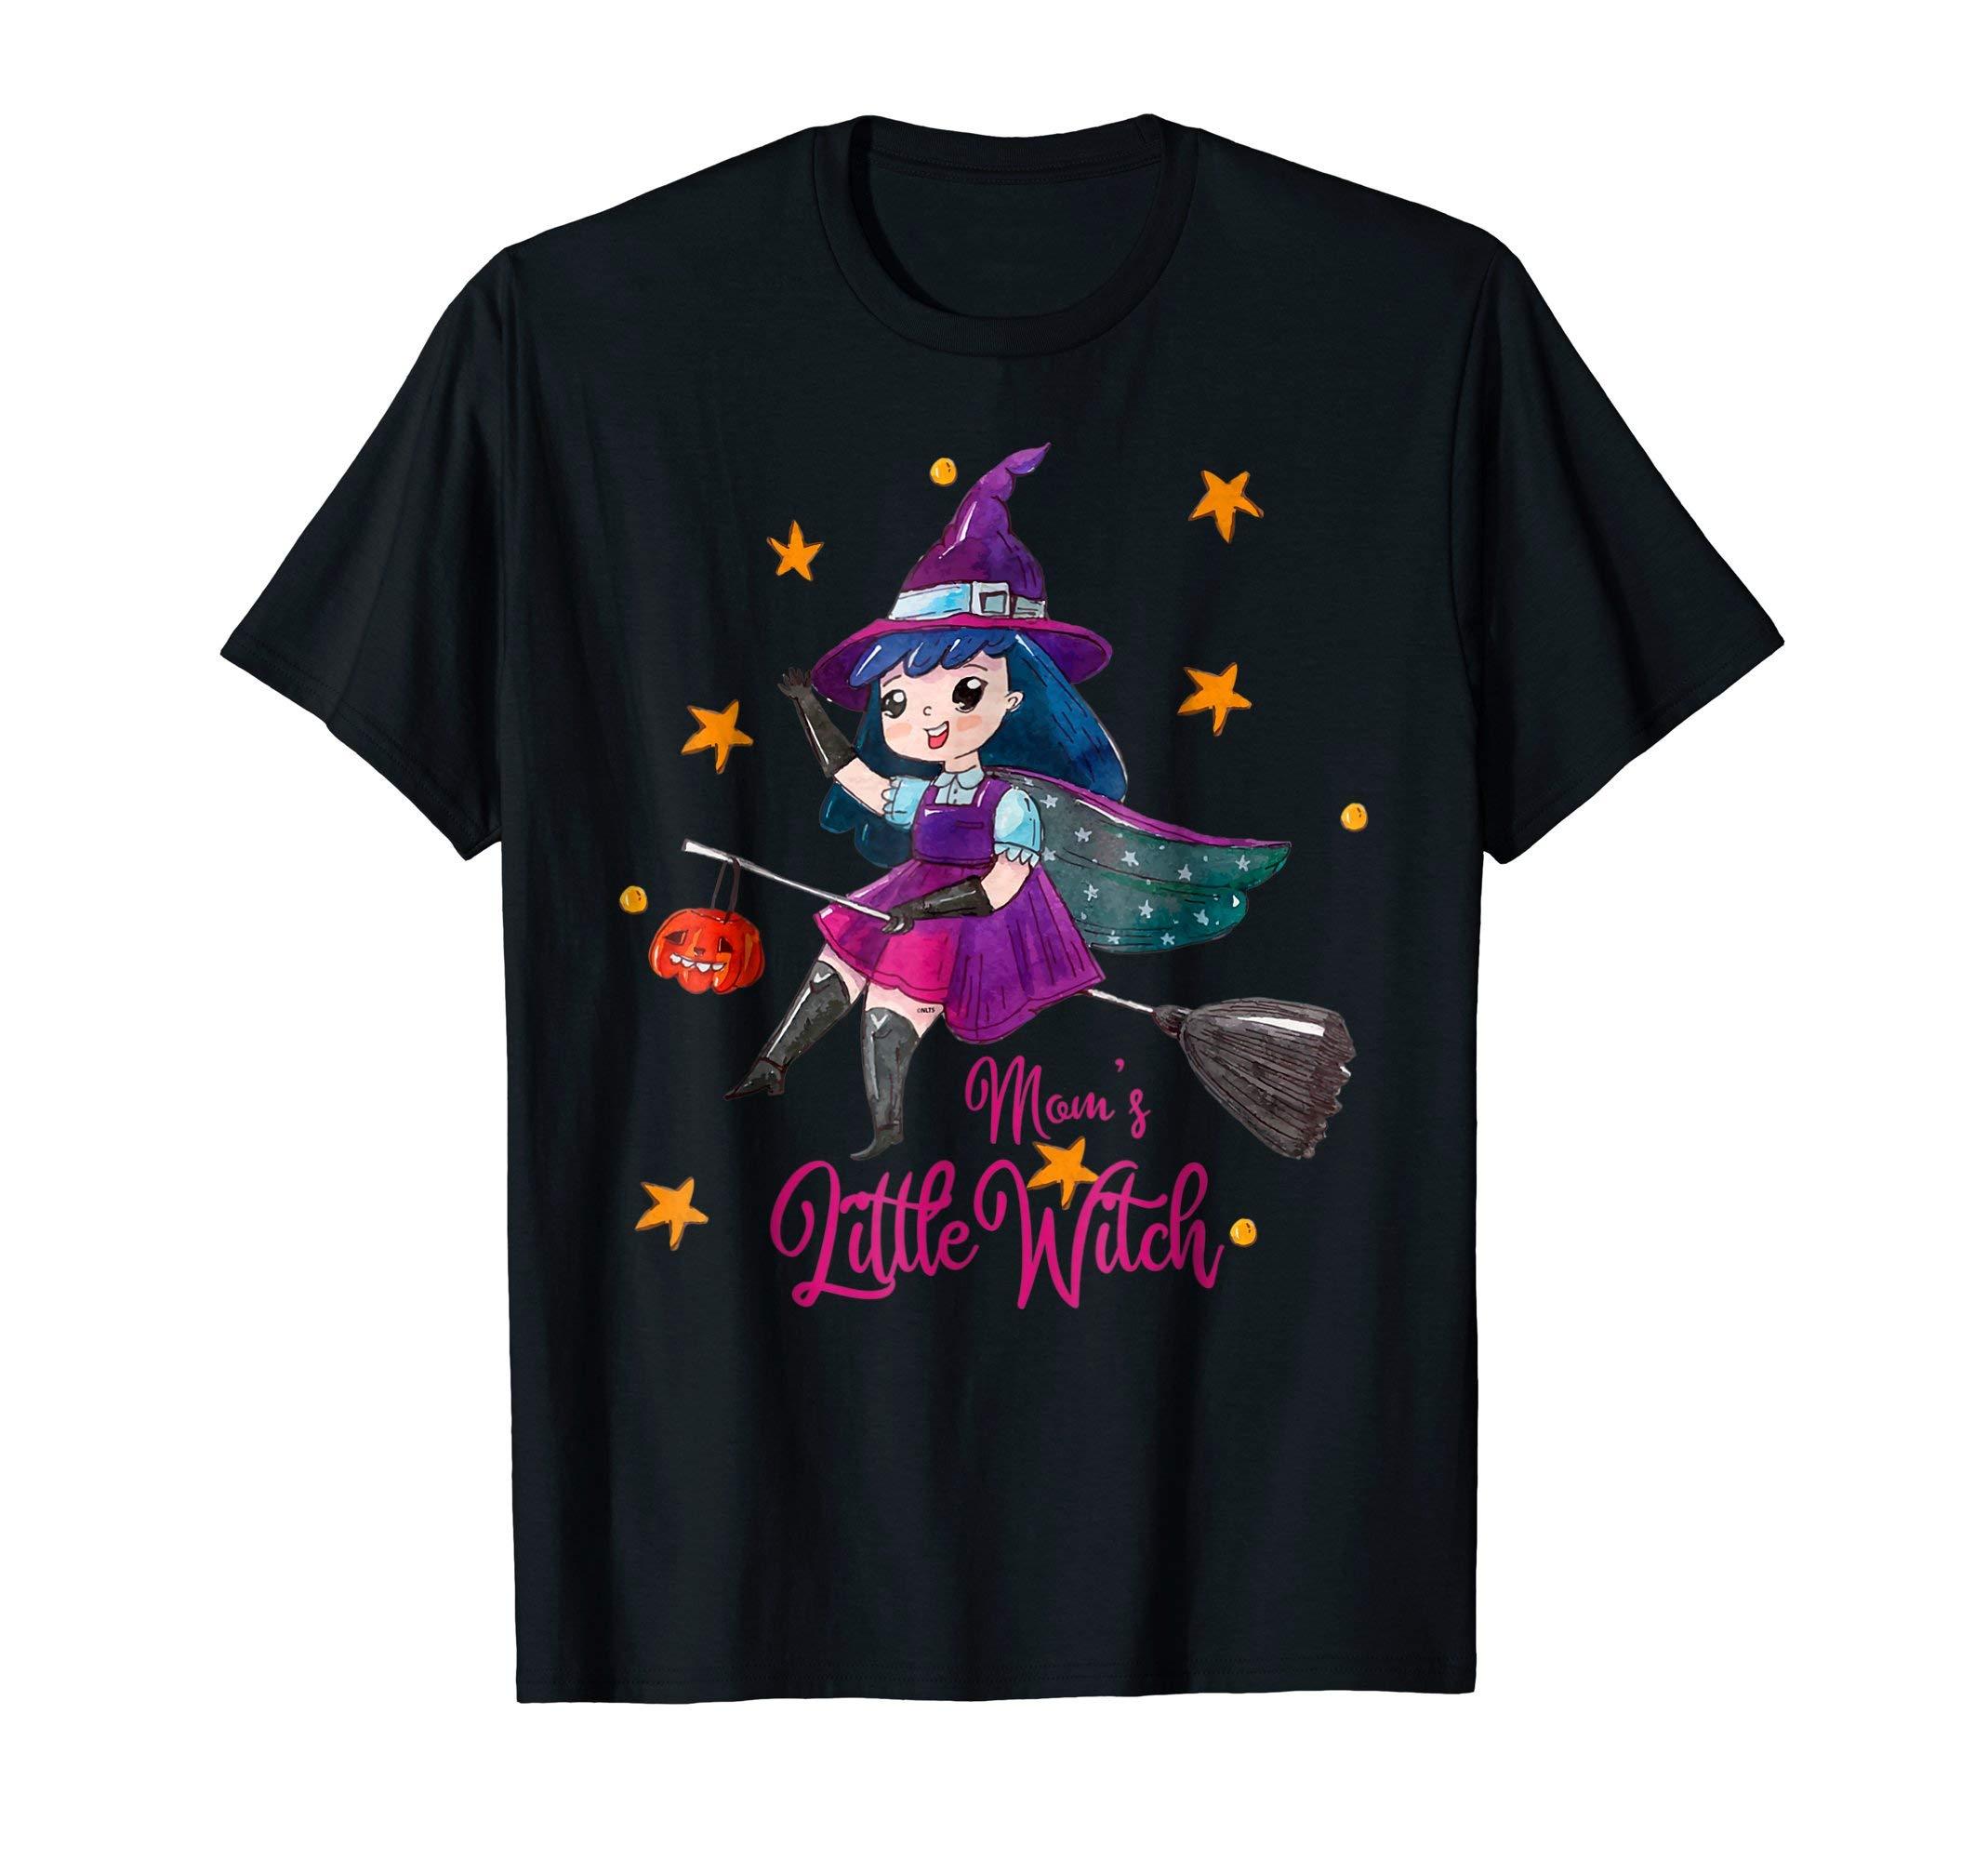 Mom-s-Little-Witch-Halloween-T-Shirt-Tee-Gifts-Shirt